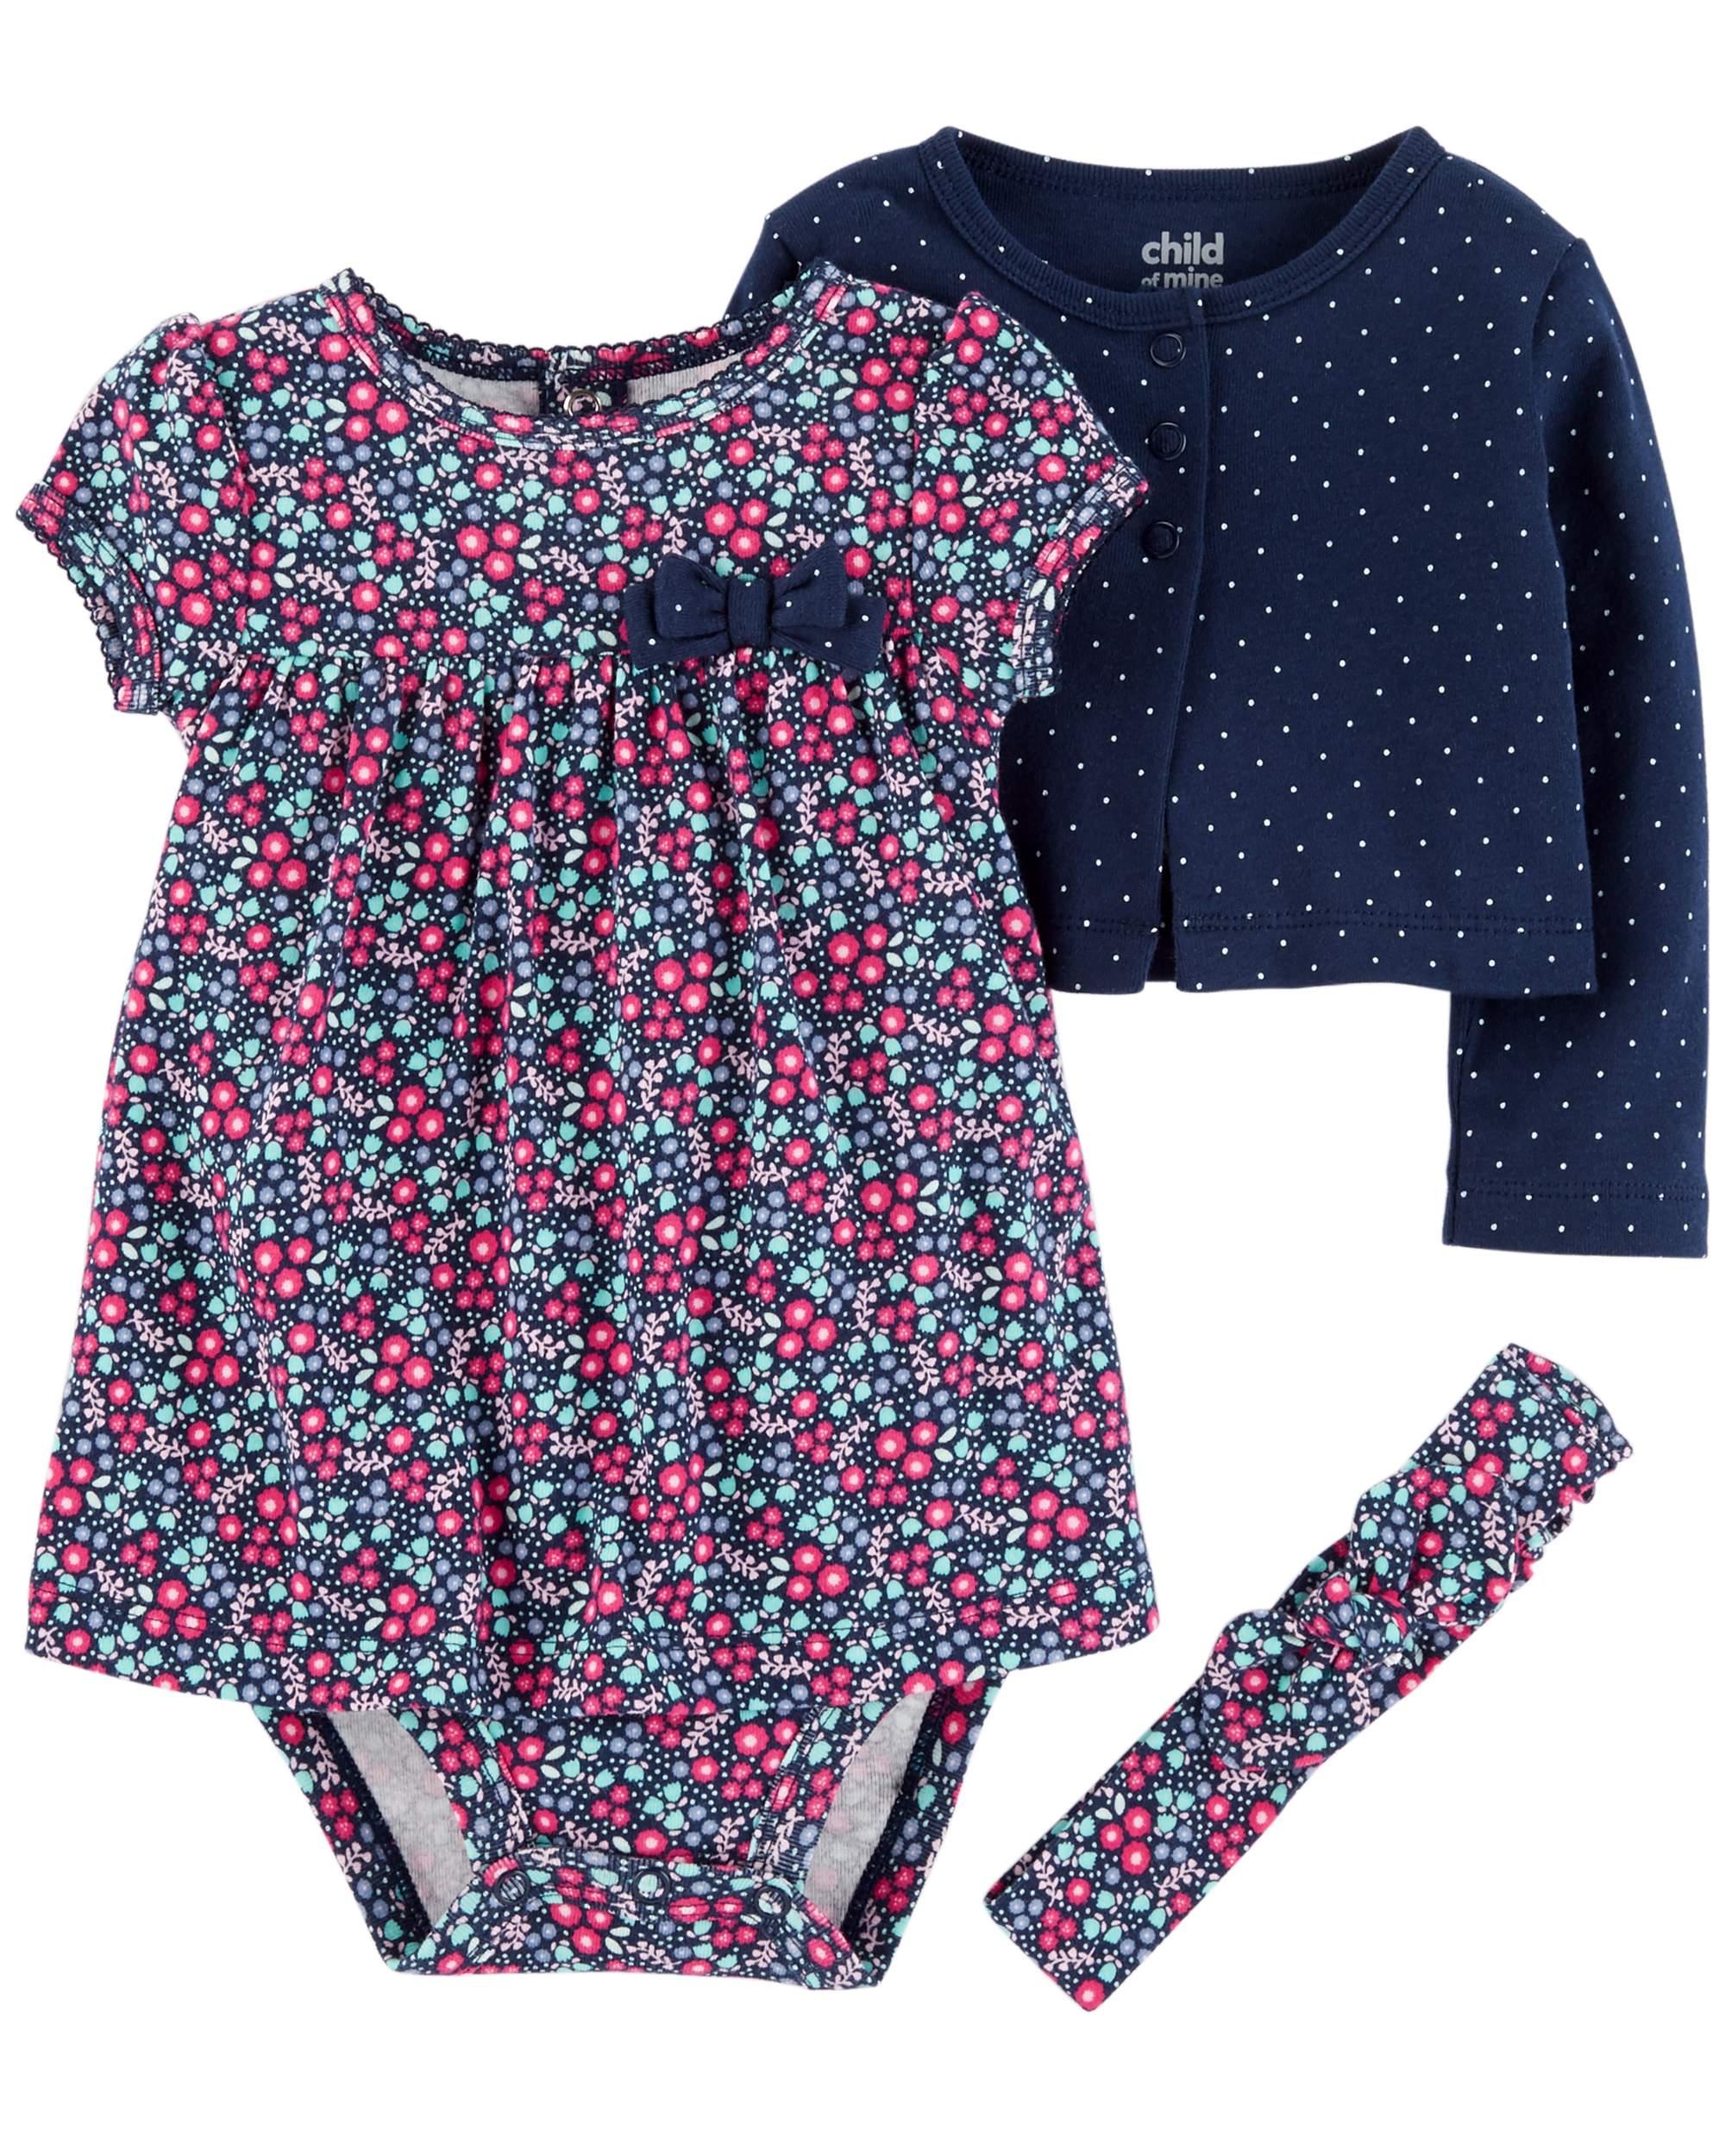 Long Sleeve Cardigan, Dress & Headband, 3pc Outfit Set (Baby Girls)